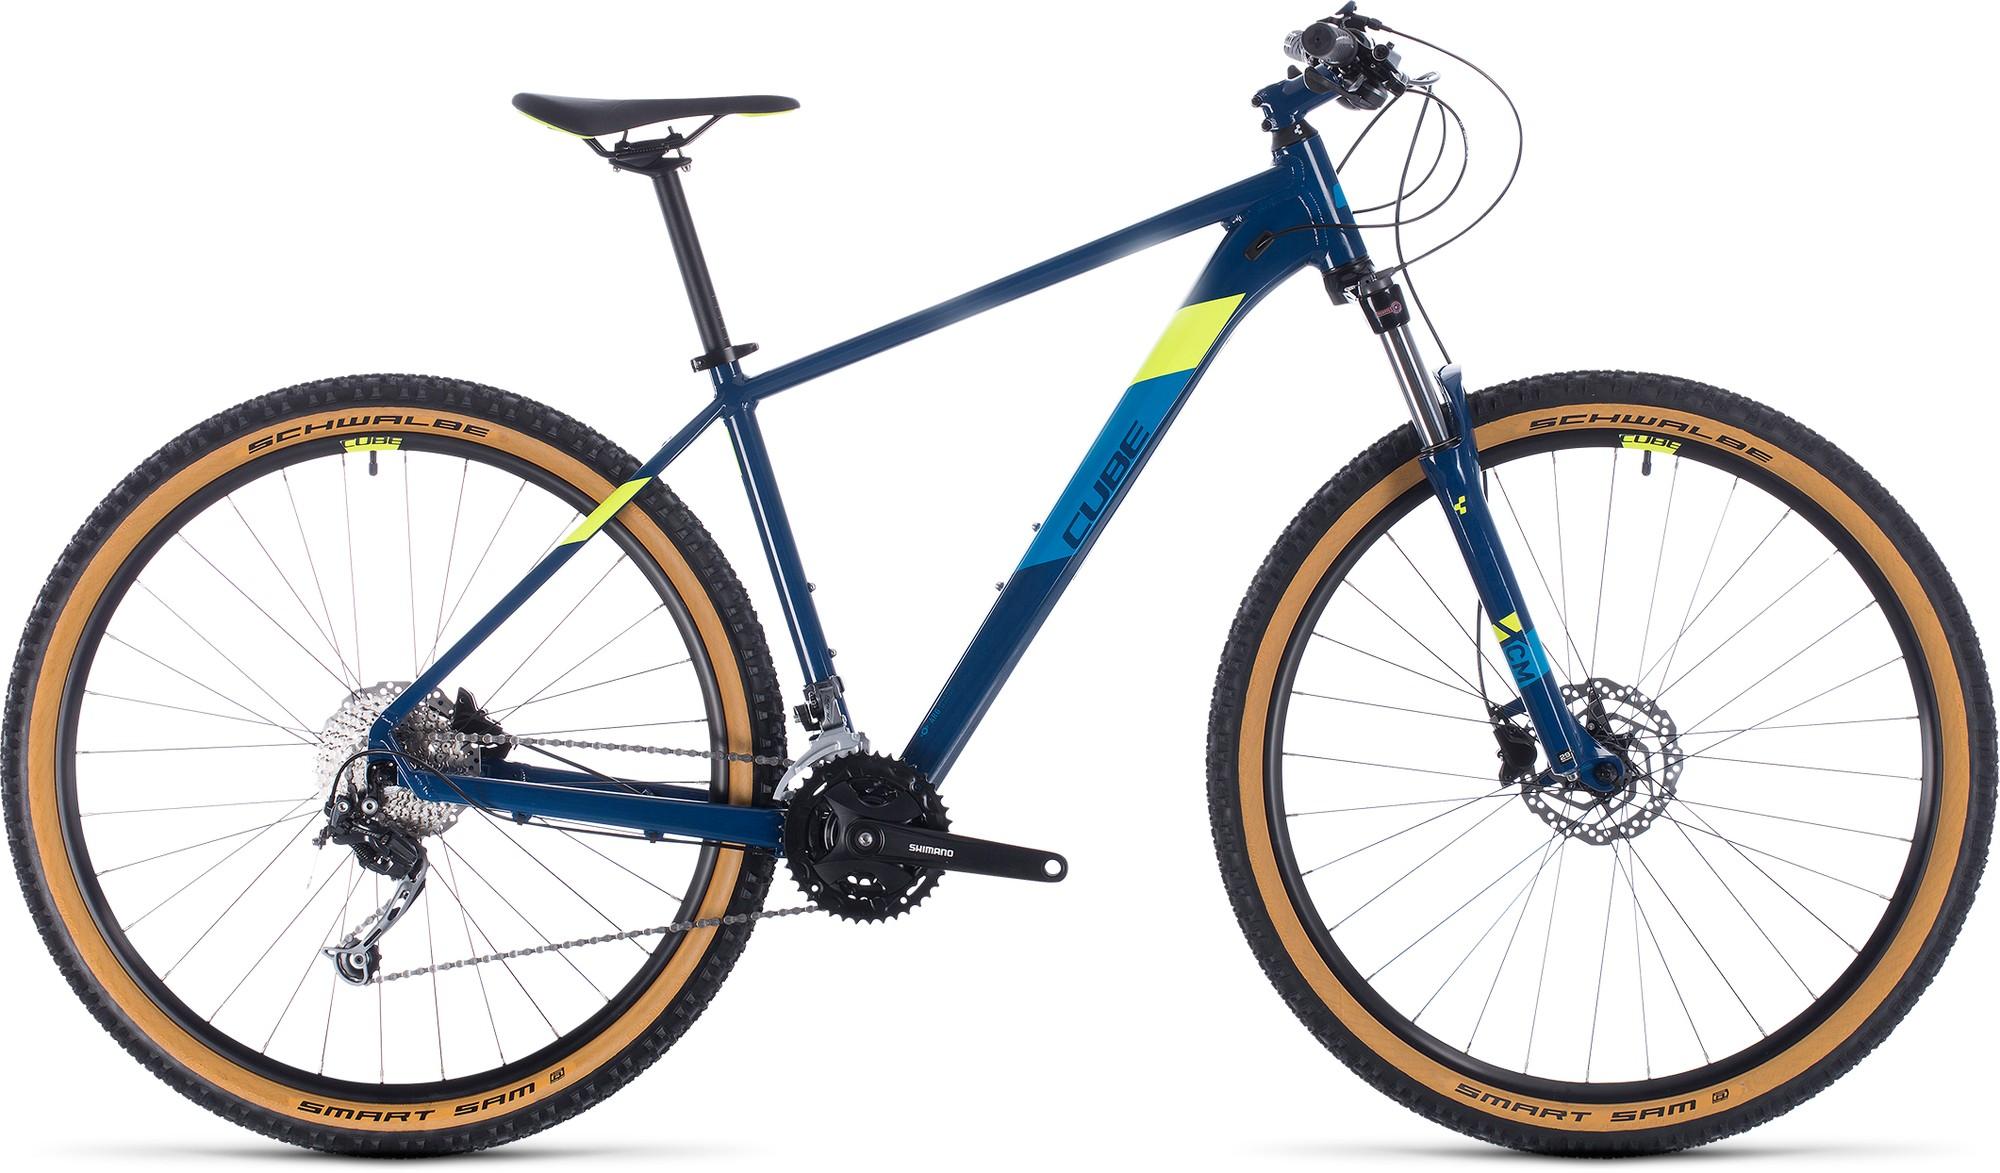 Cube Велосипед горный CUBE Aim Sl велосипед cube hyde 2018